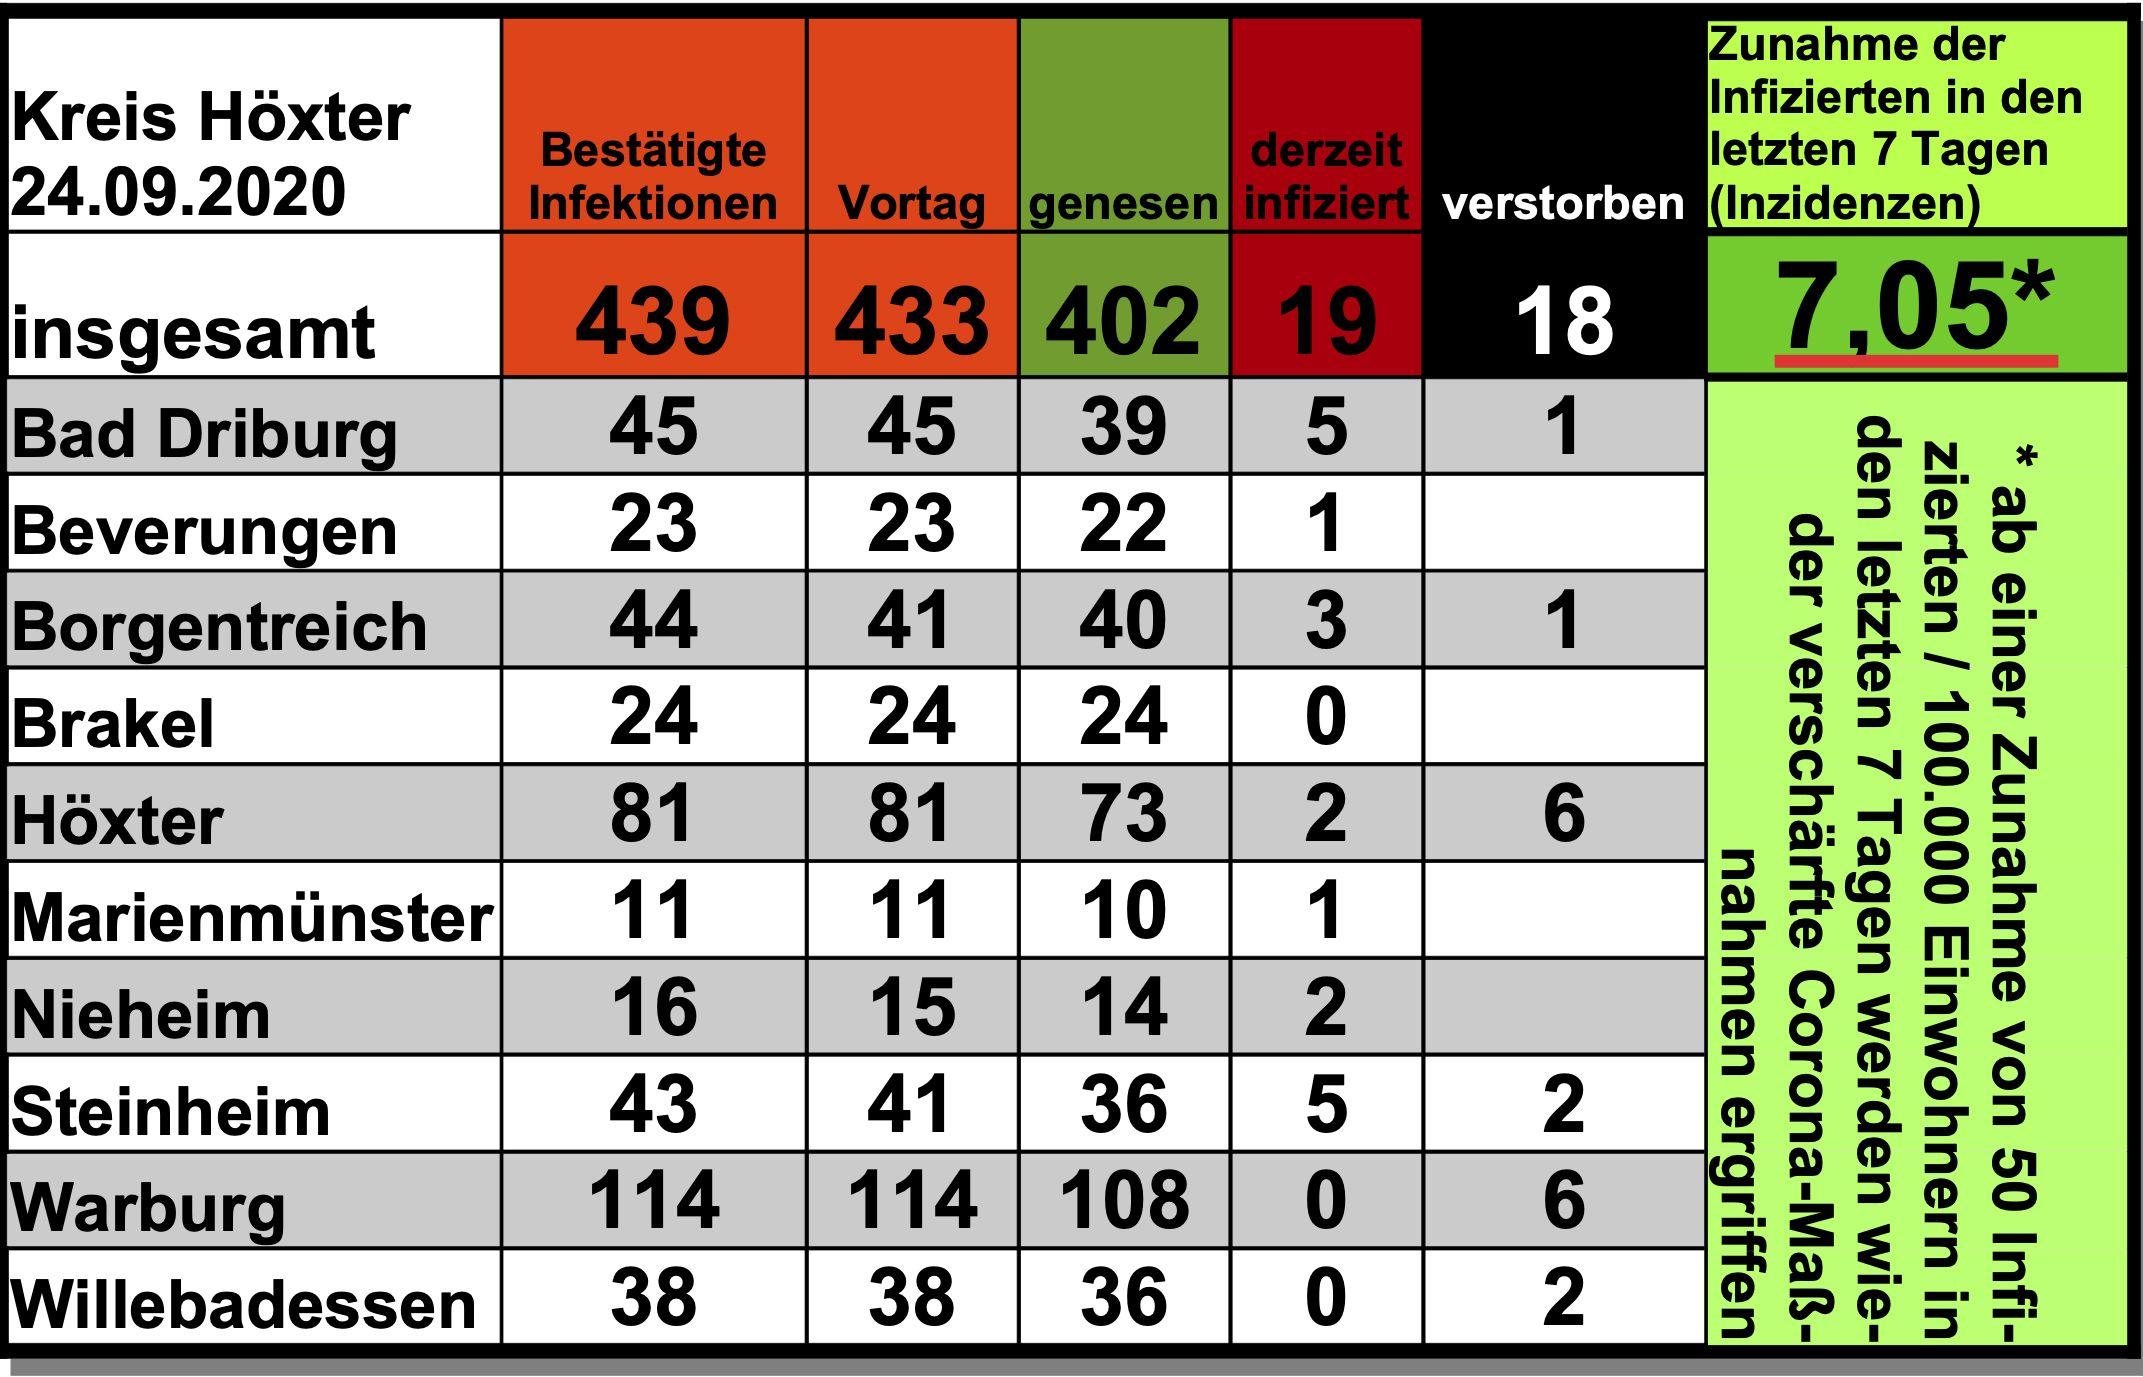 Update 24 September 6 Weitere Nachgewiesene Infektionen Im Kreis Hoxter Bad Driburg Kreis Hoxter Kreis